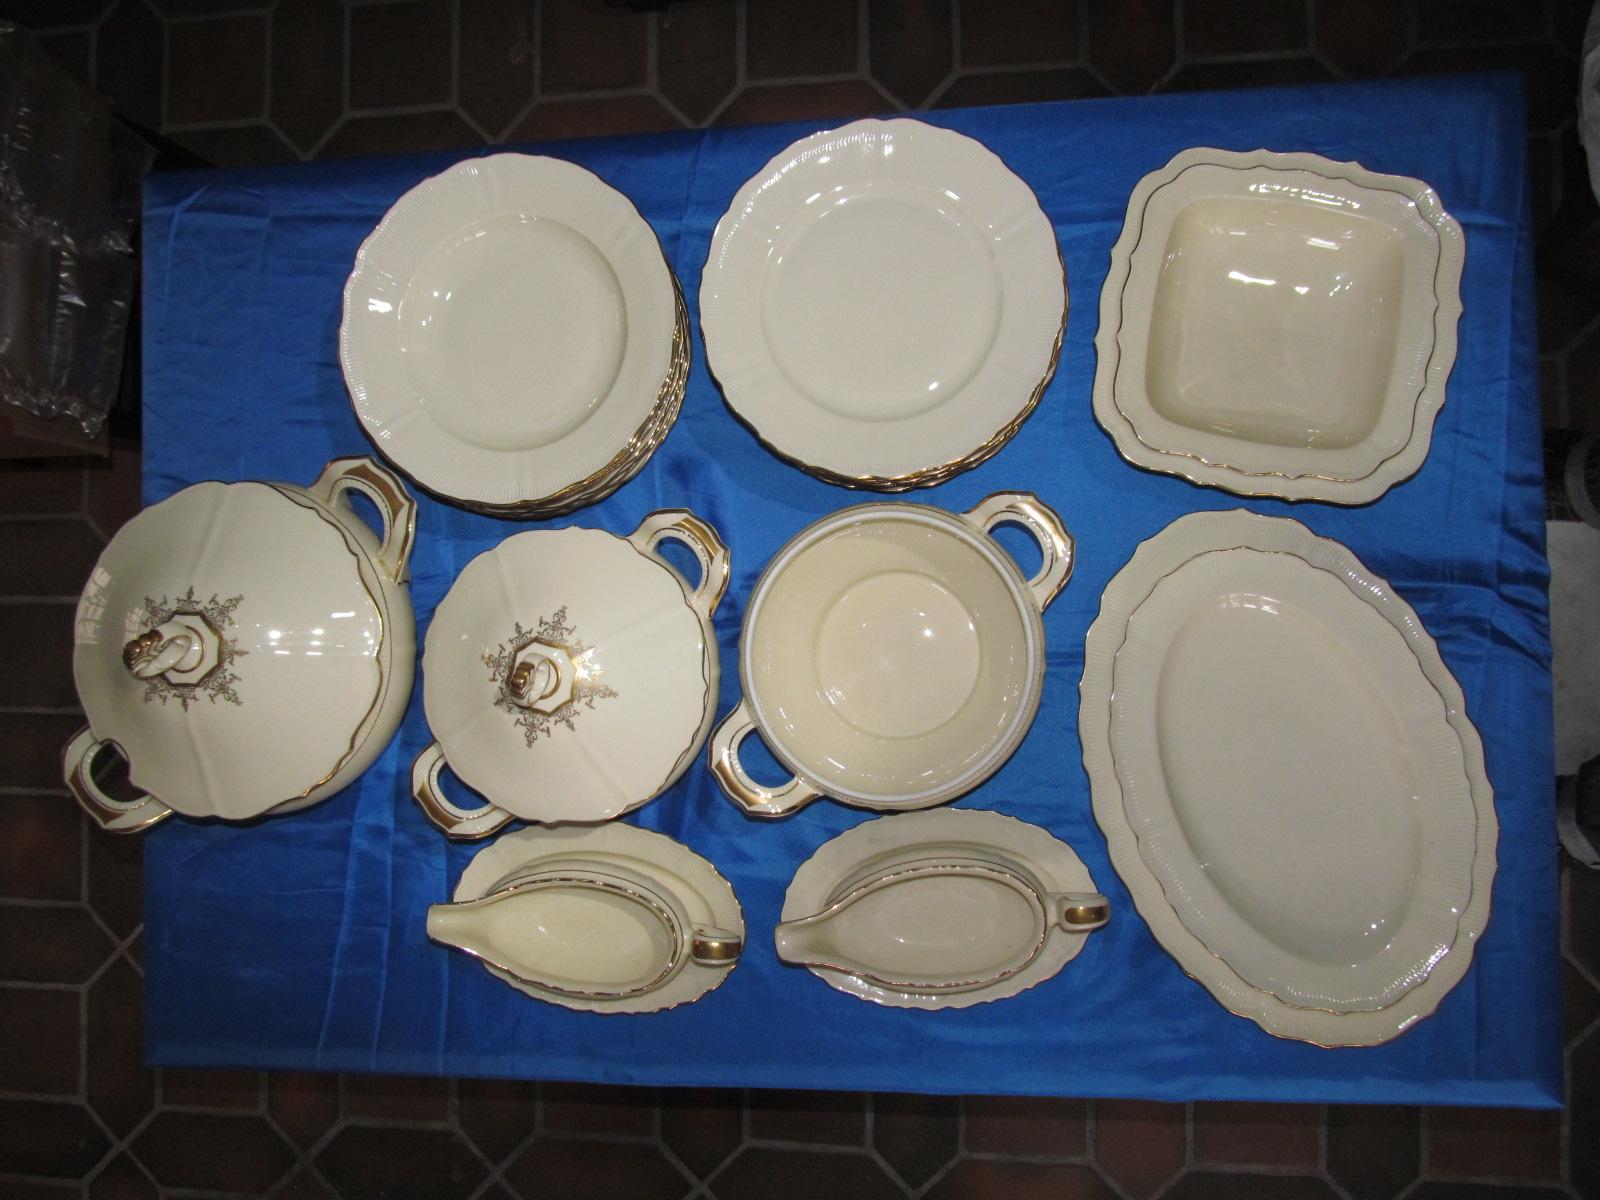 reichenbach porzellan speise service 10 pers barock goldrand porcelaine ebay. Black Bedroom Furniture Sets. Home Design Ideas